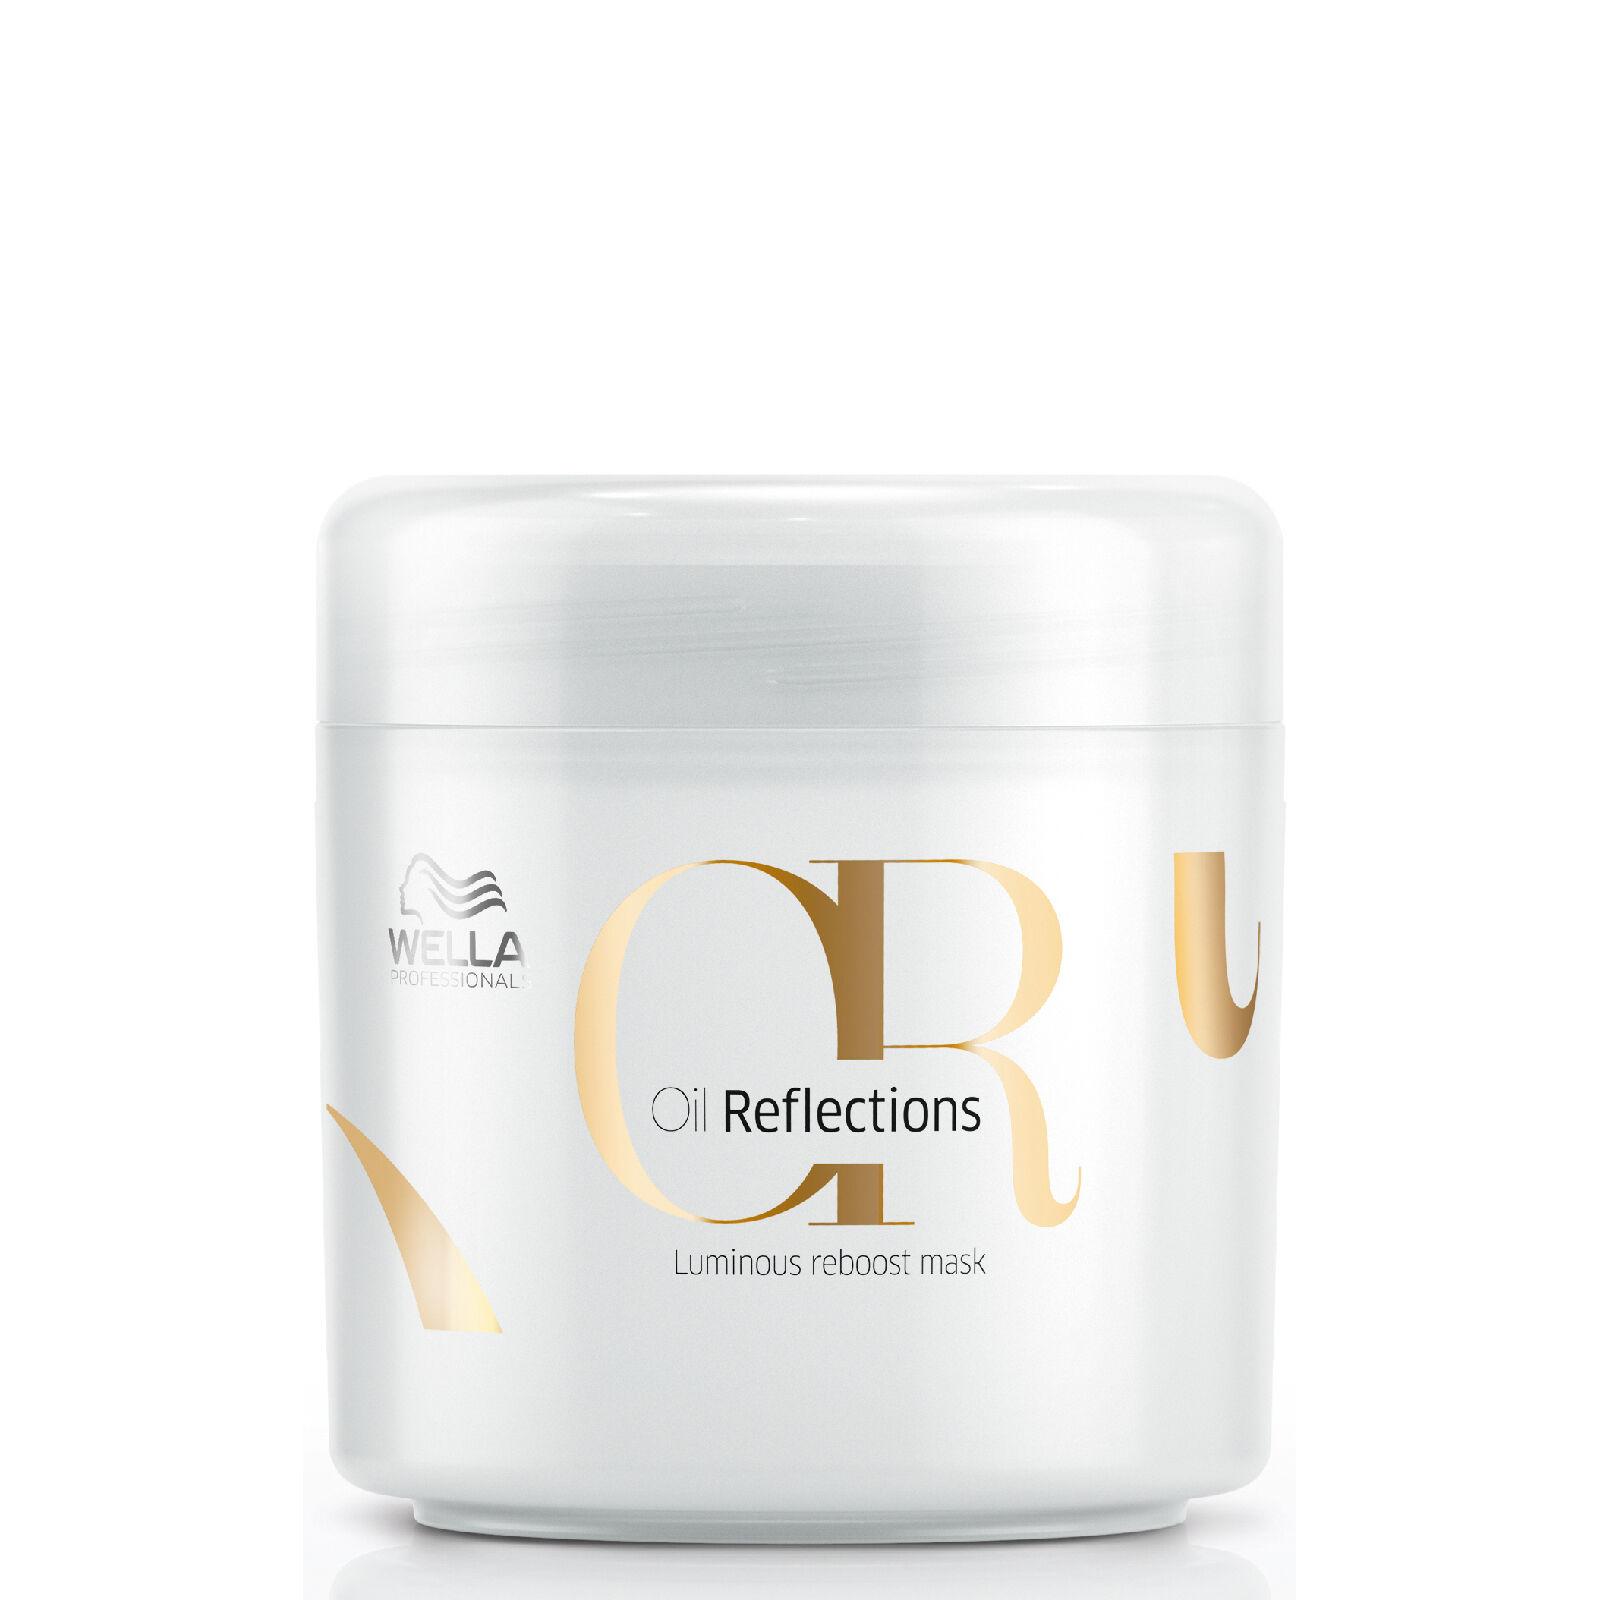 Wella Professionals Care Masque Nourrissant Lumineux Luminous Reboost Mask Oil Reflections Wella Professionals Care 150ml